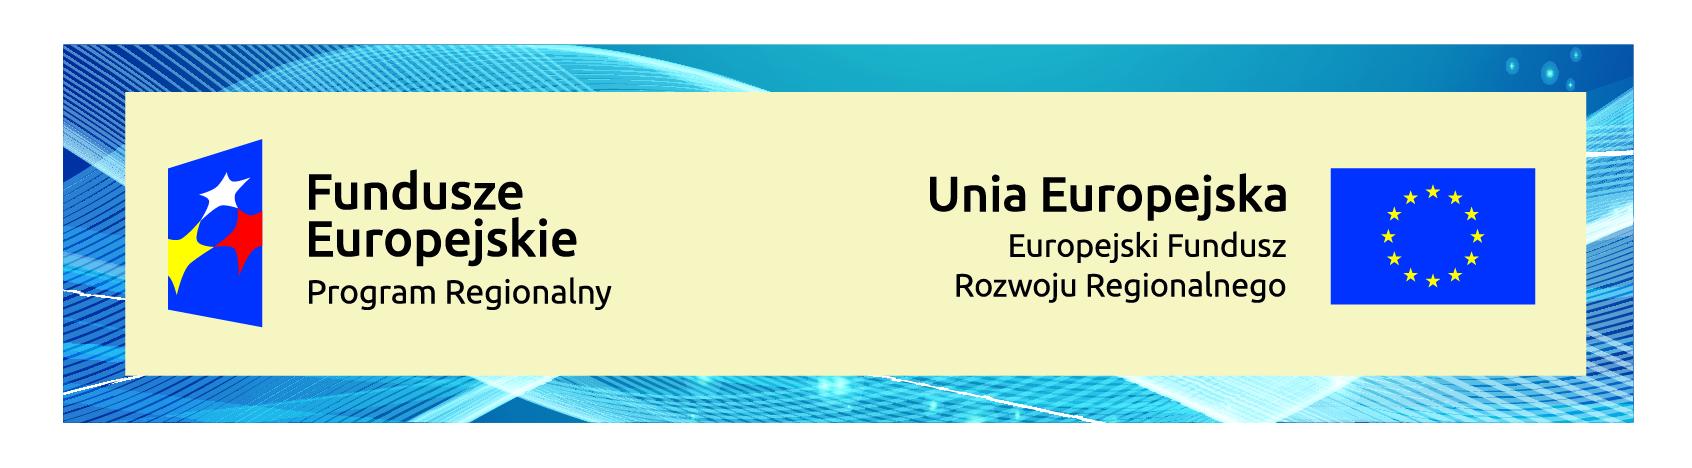 https://rpo.lubelskie.pl/site/assets/files/4617/rozwiazanie_1_efrr.jpg